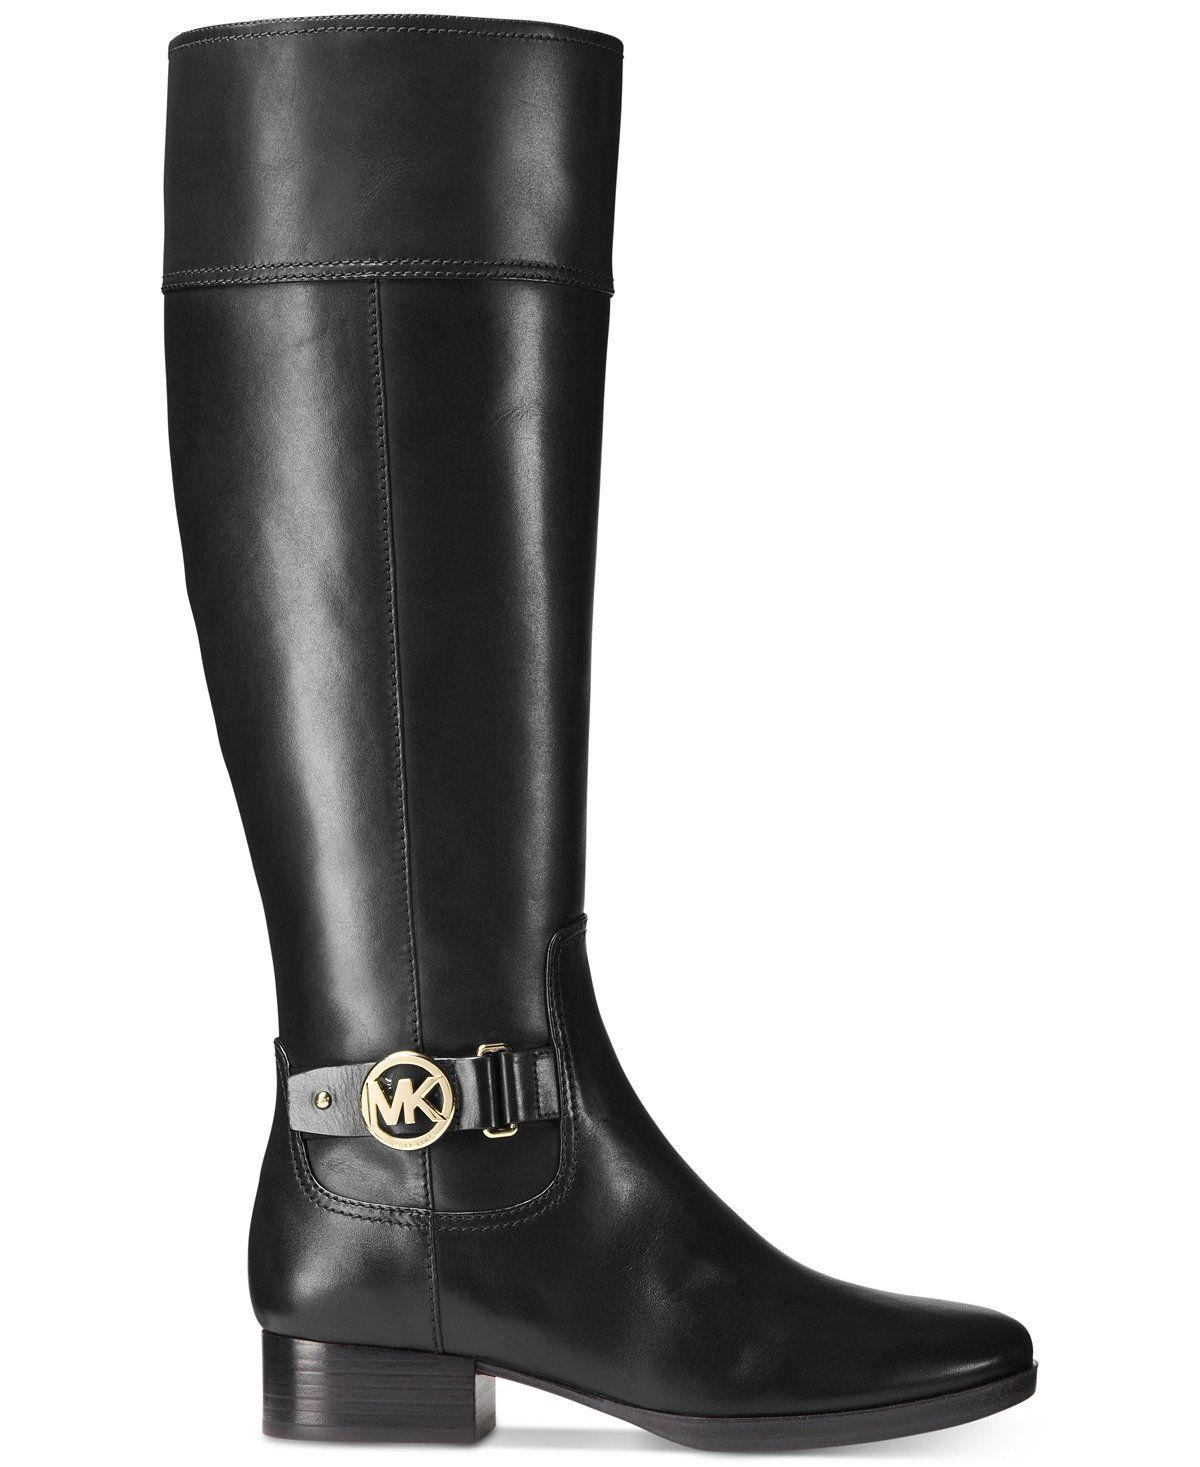 40ed57982d1a MICHAEL Michael Kors Harland Riding Boots - Michael Kors Boots - Shoes -  Macy s